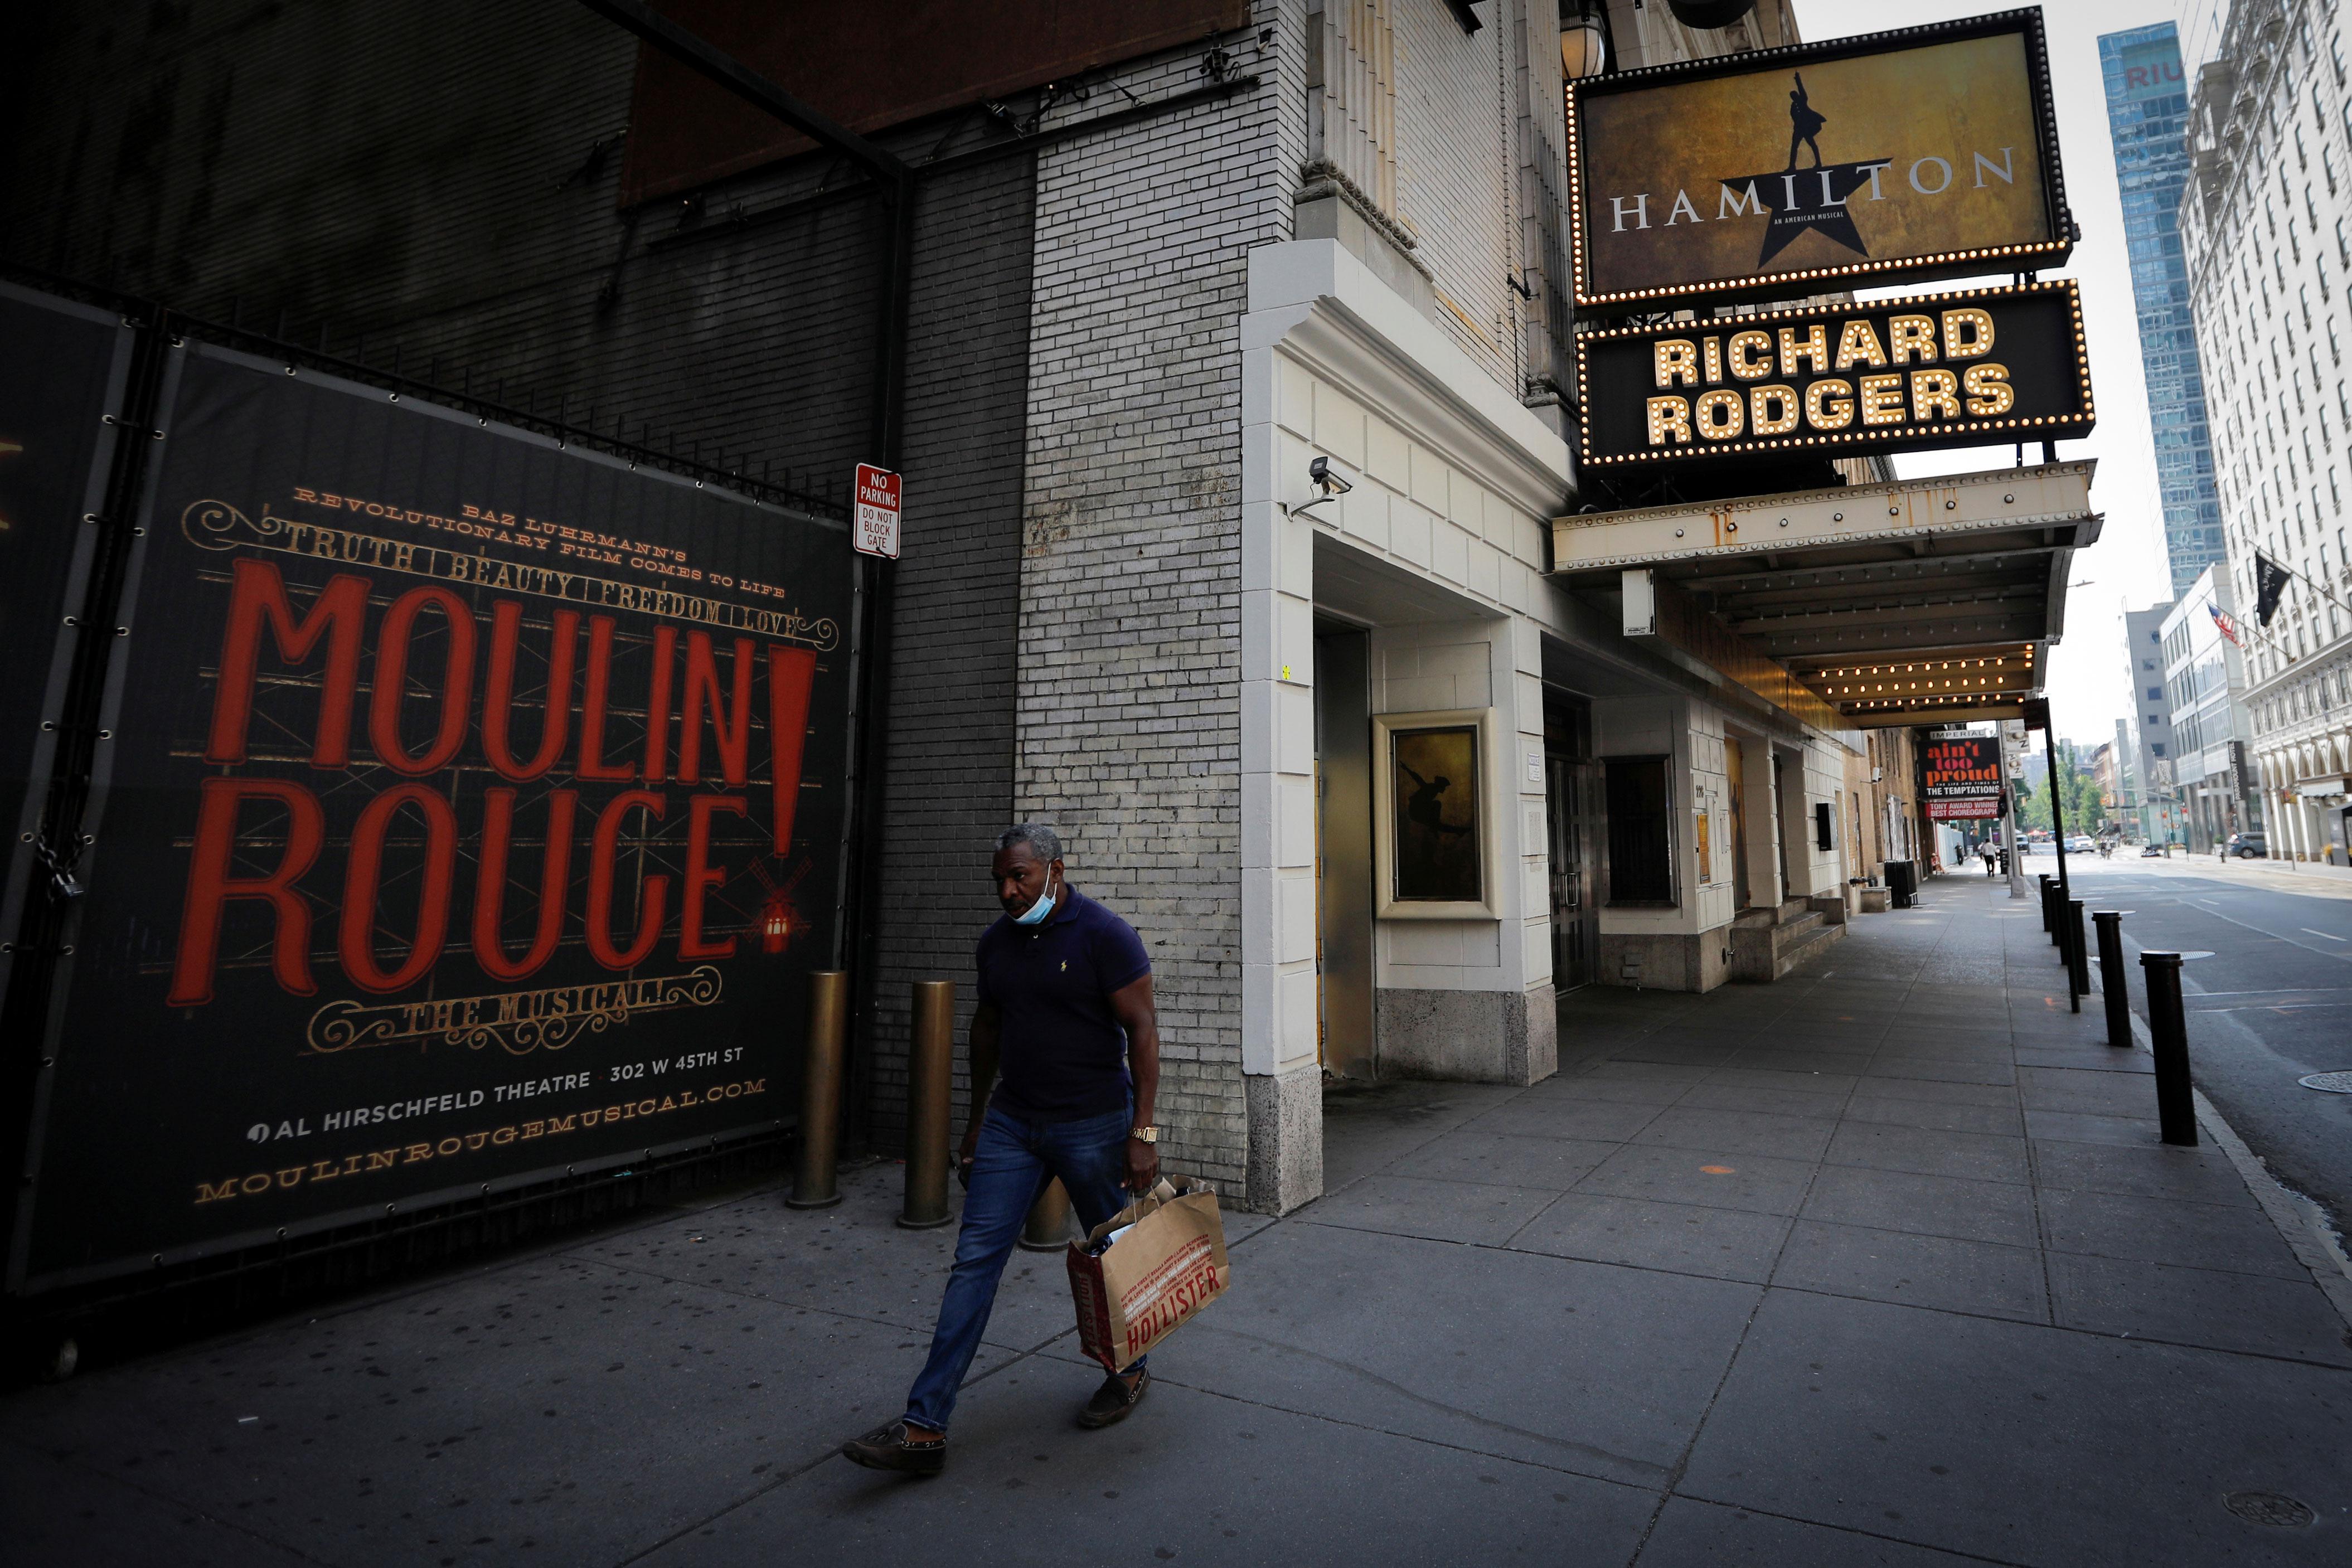 Teatro Richard Rodgers, que está fechado, e é palco do popular musical Hamilton